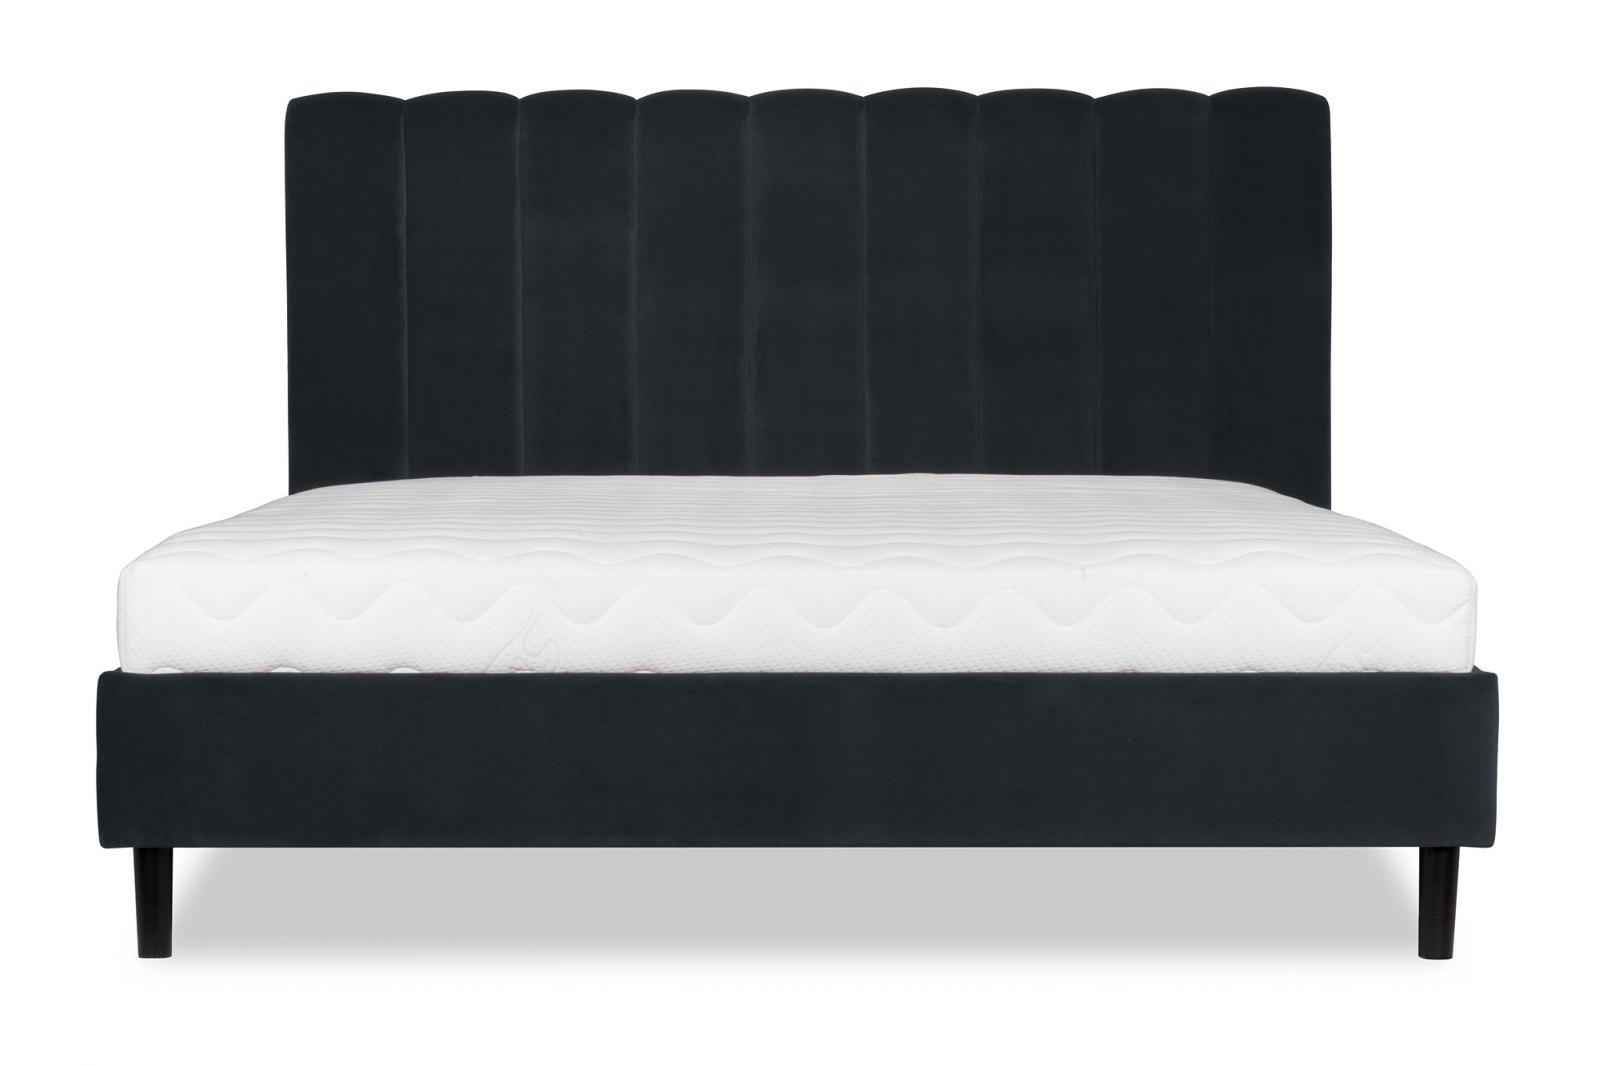 Vivien Velvet Double Bed 140cm / 1